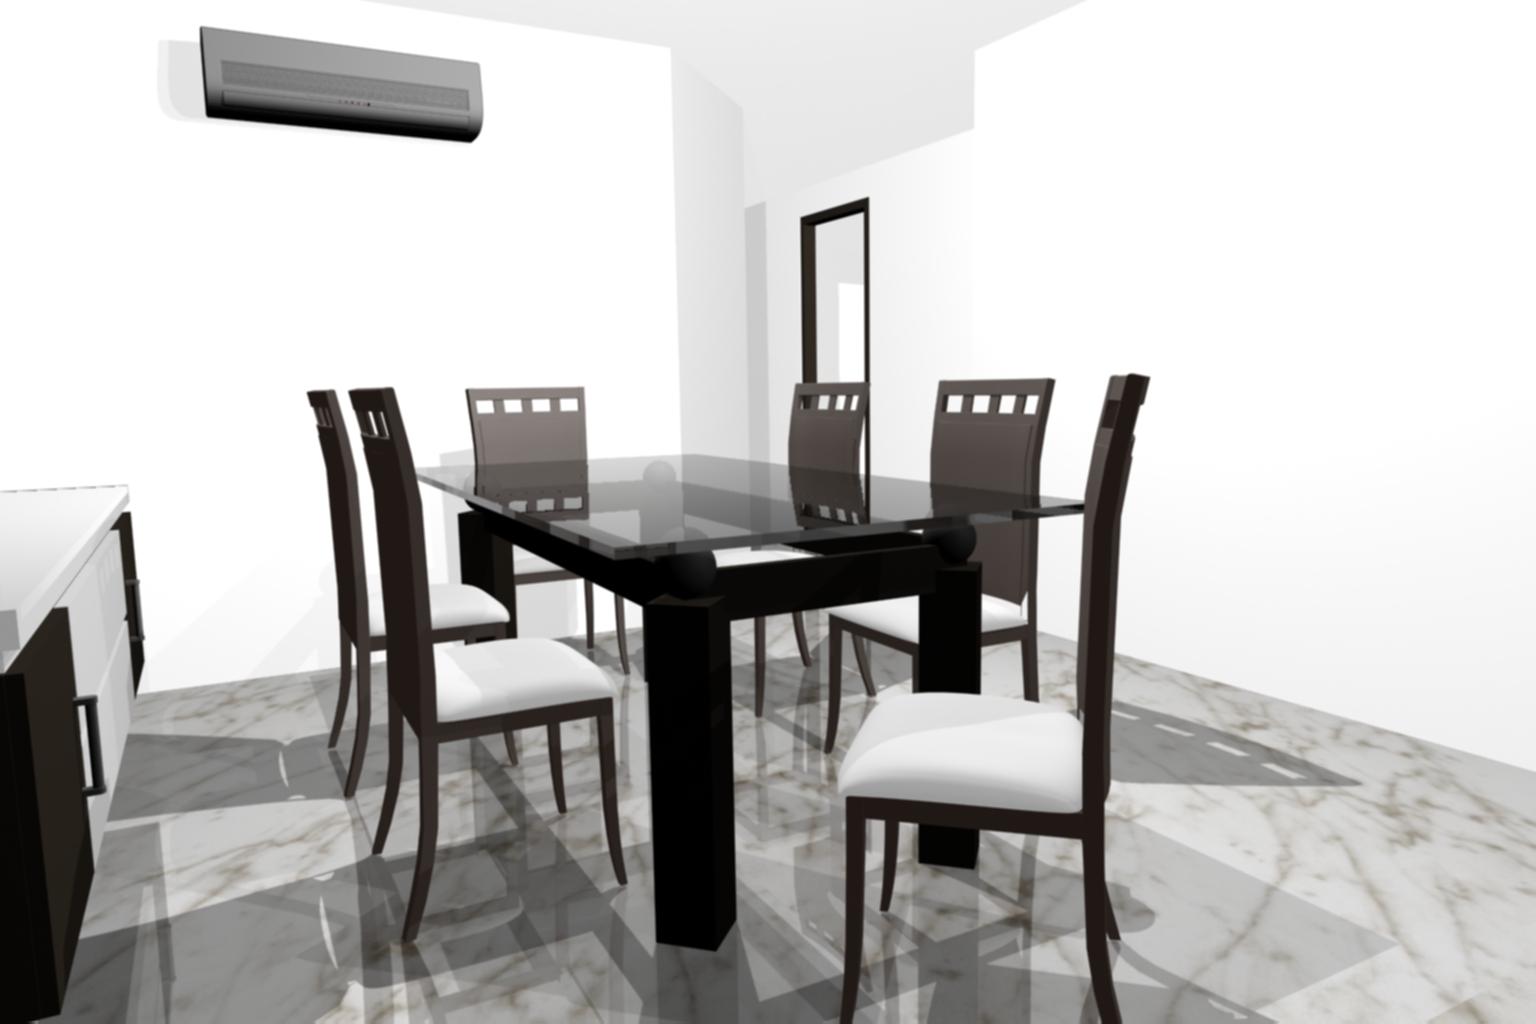 Comercial cobala s a comedores - Muebles de vidrio ...